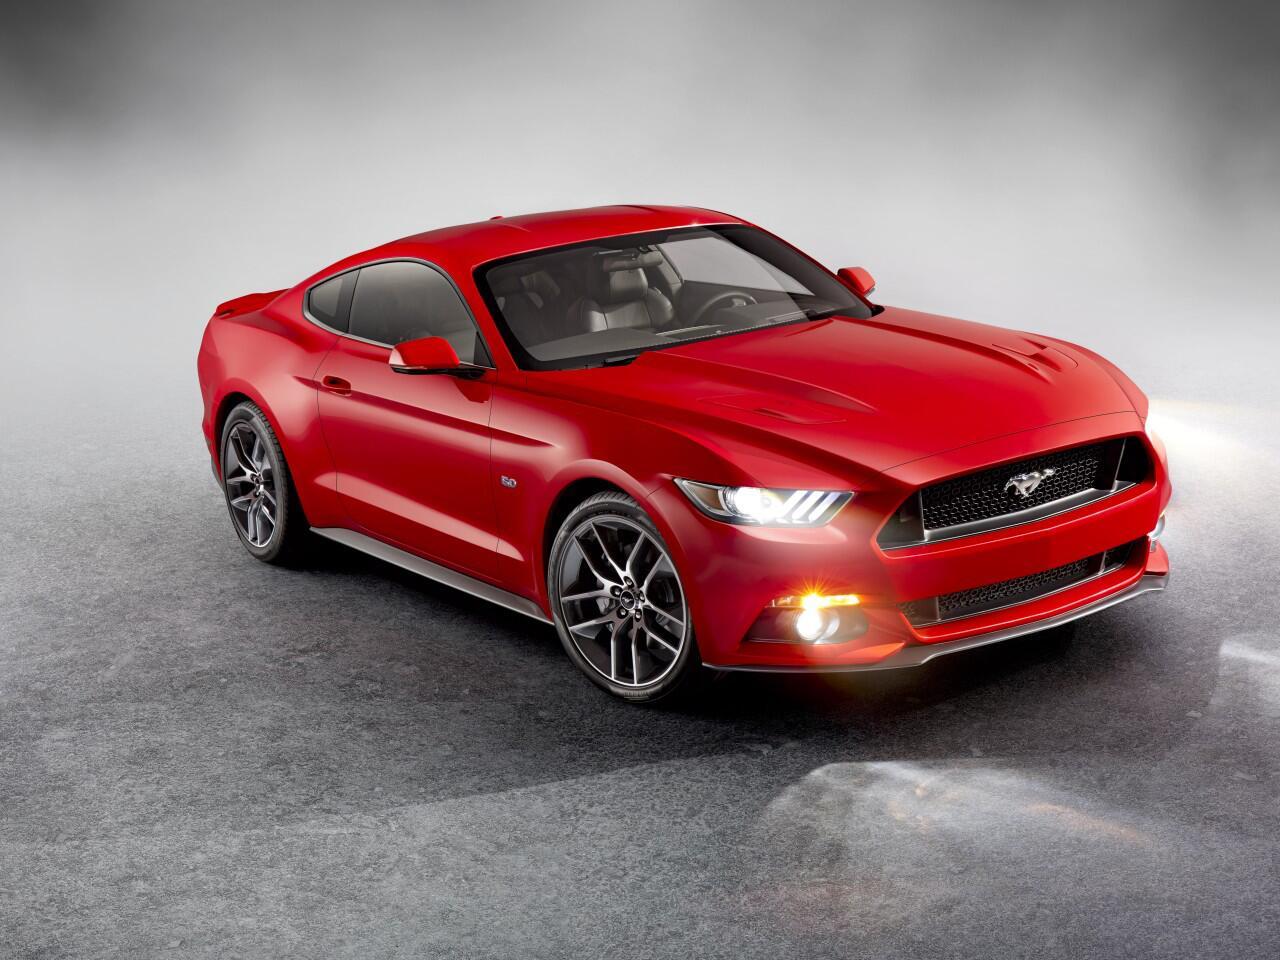 Bild zu Auch heute noch lässt der Ford Mustang das Adrenalin ins Blut schießen